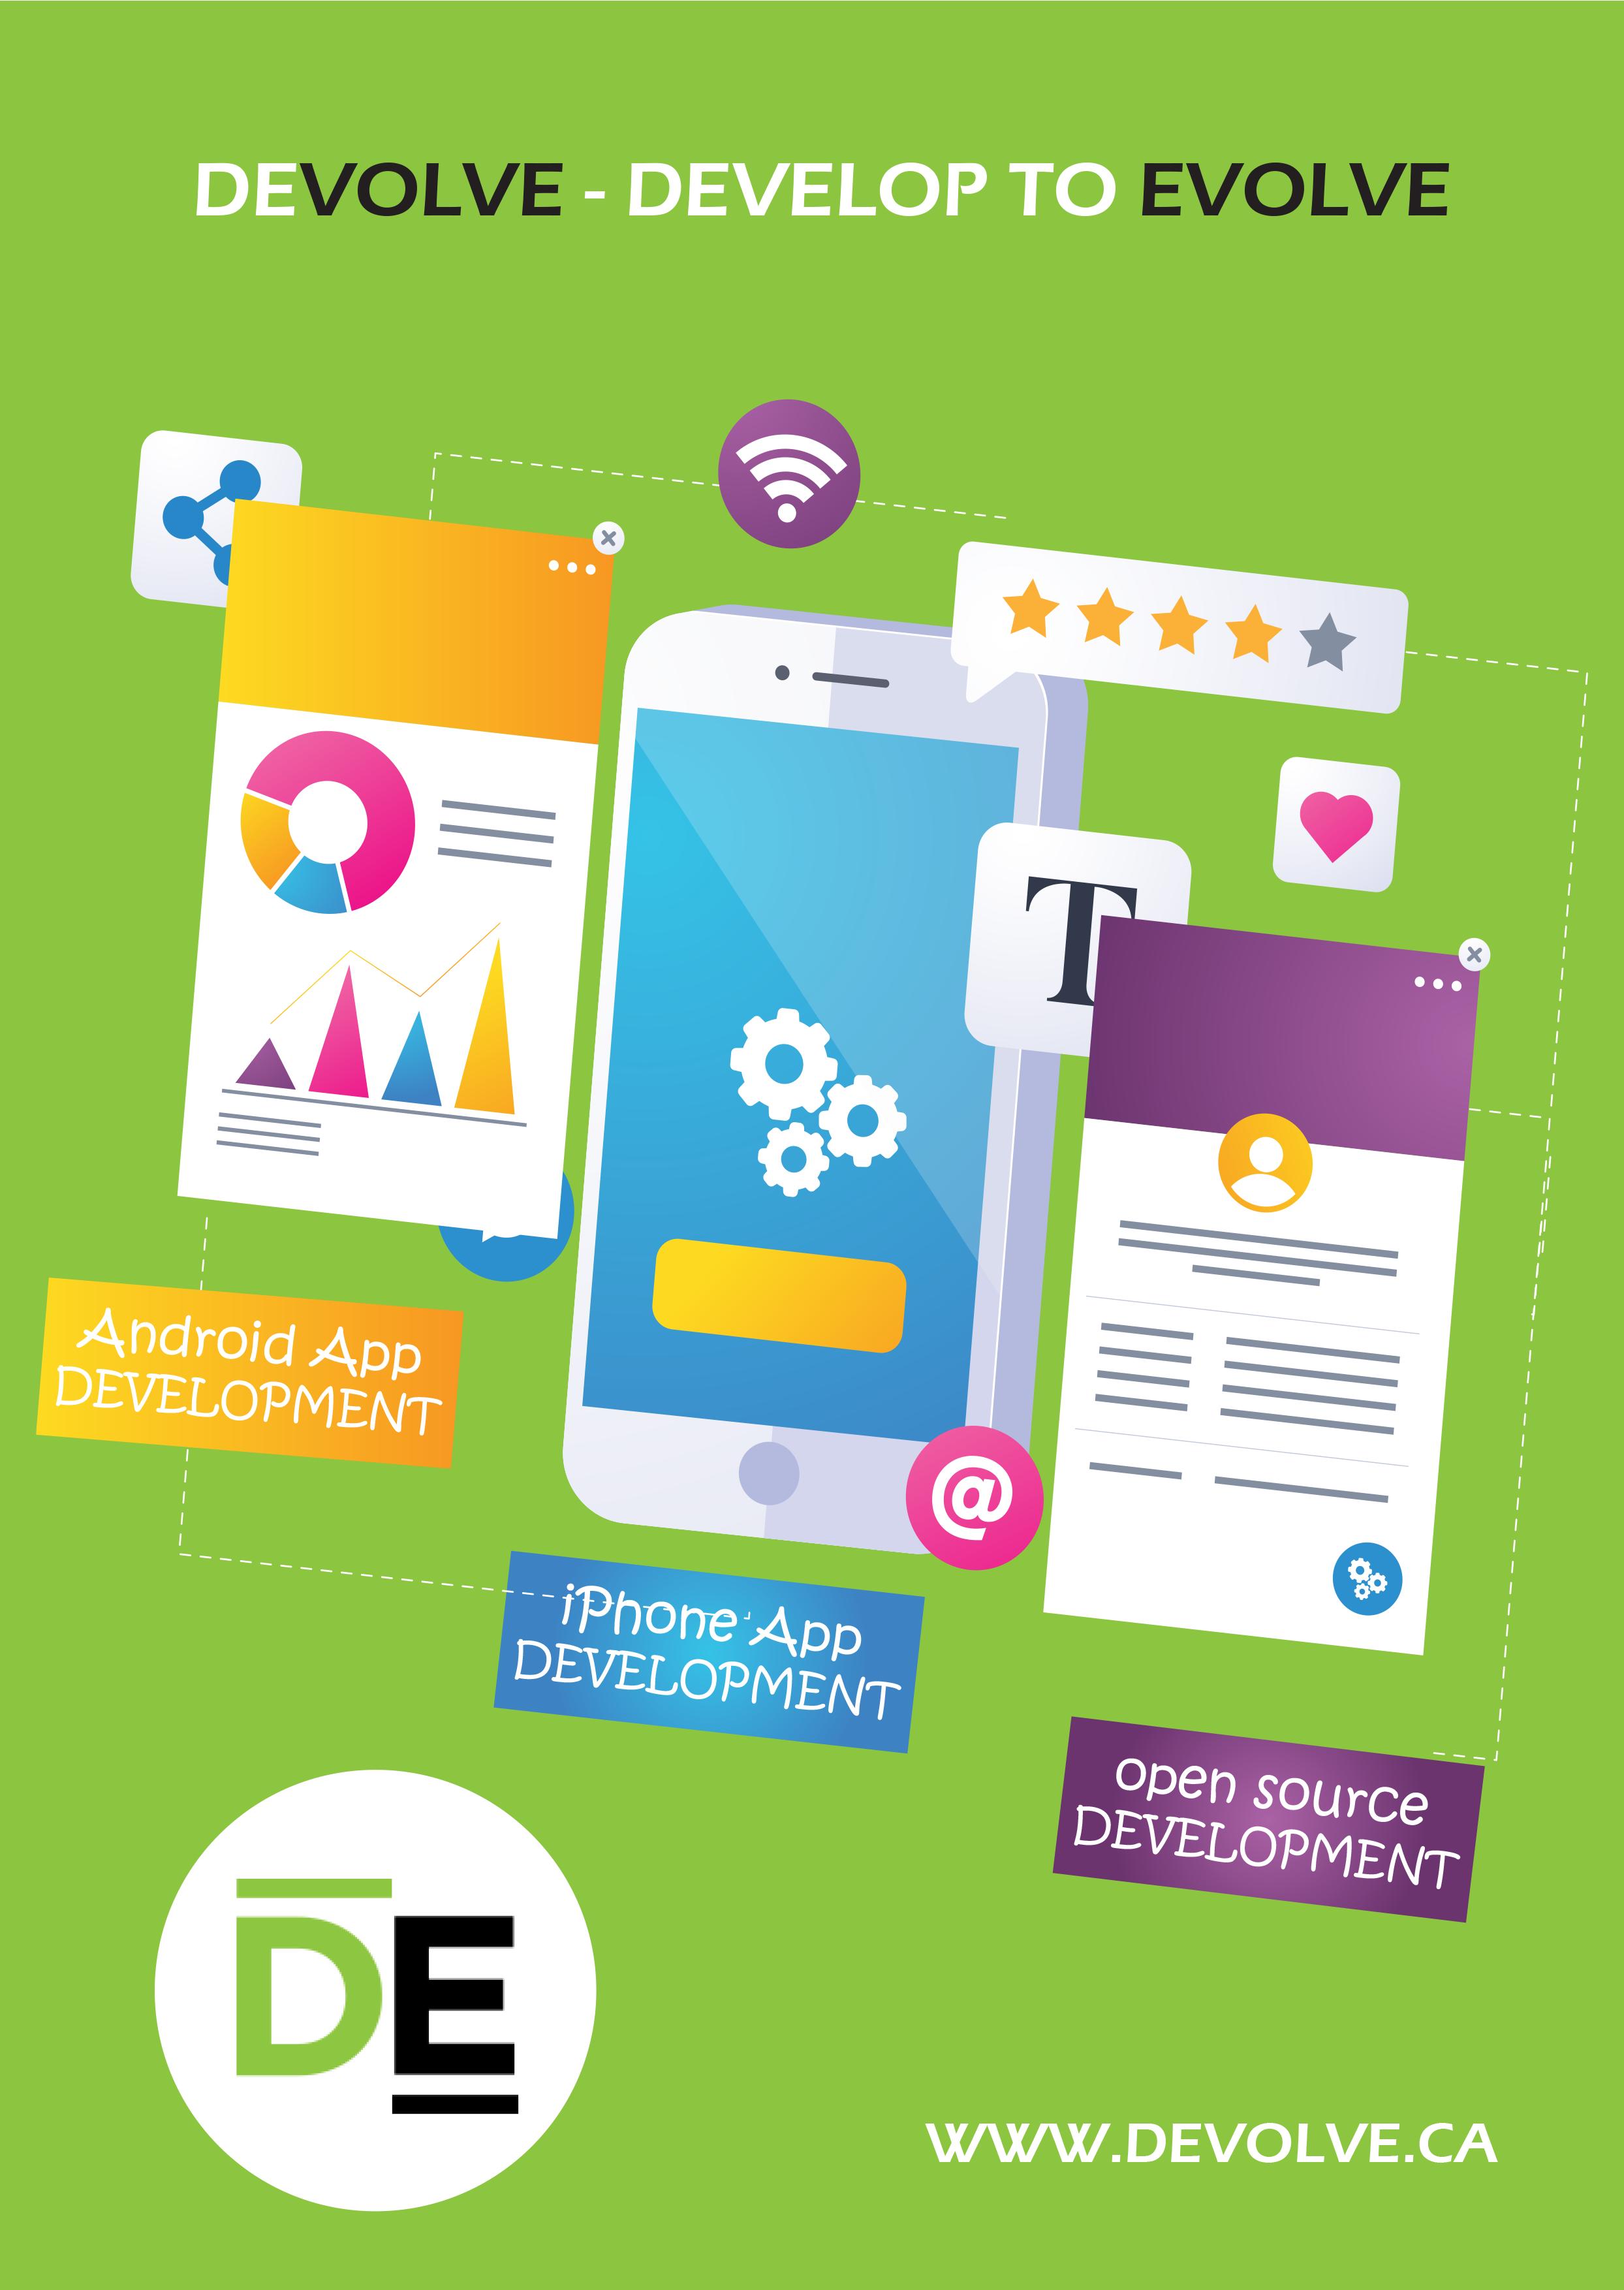 Devolve is Calgary's pioneer mobile app development